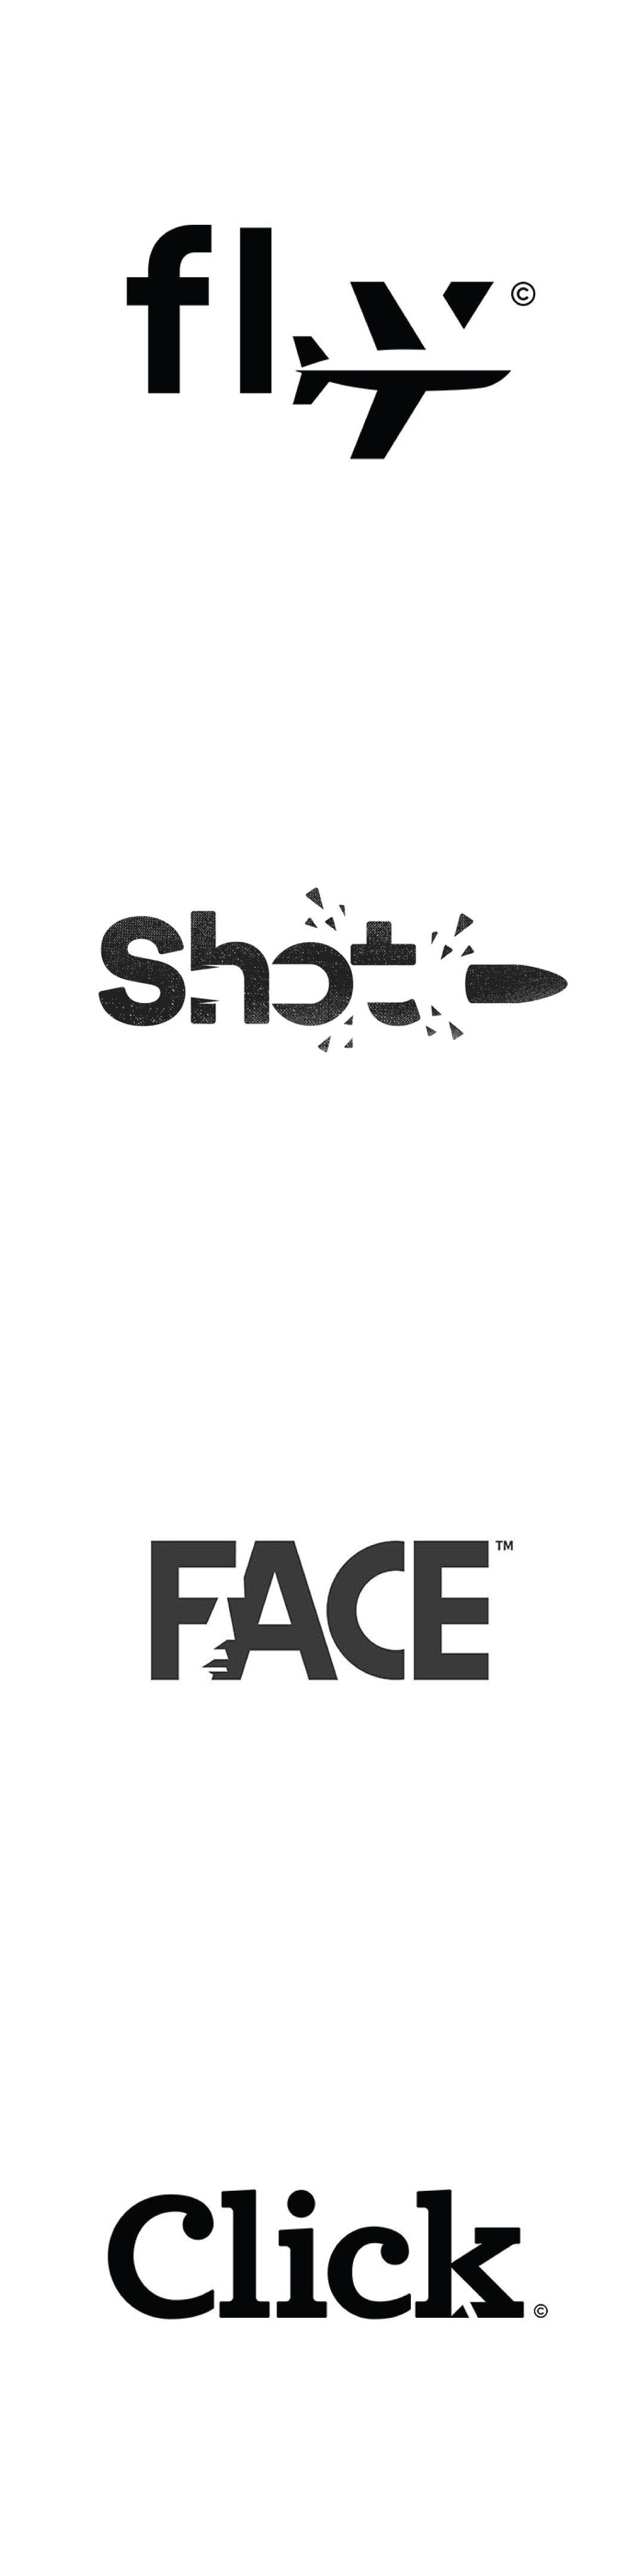 Text logo Typography,Minimal logo concept, Best Creative graphic design, Top branding inspiration ideas #graphicdesign